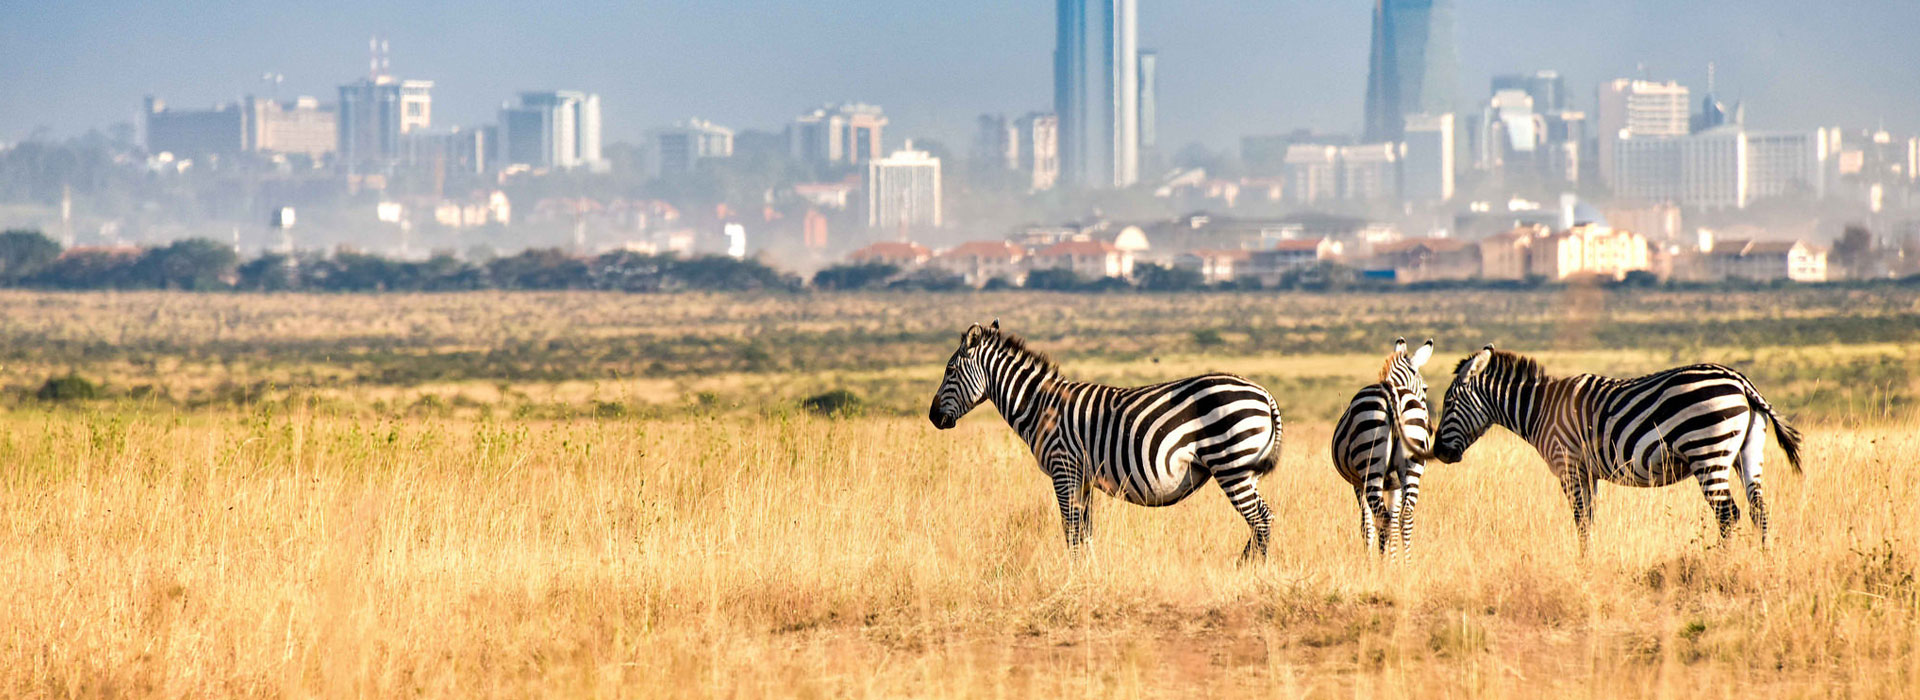 Nairobi To Nairobi Safari